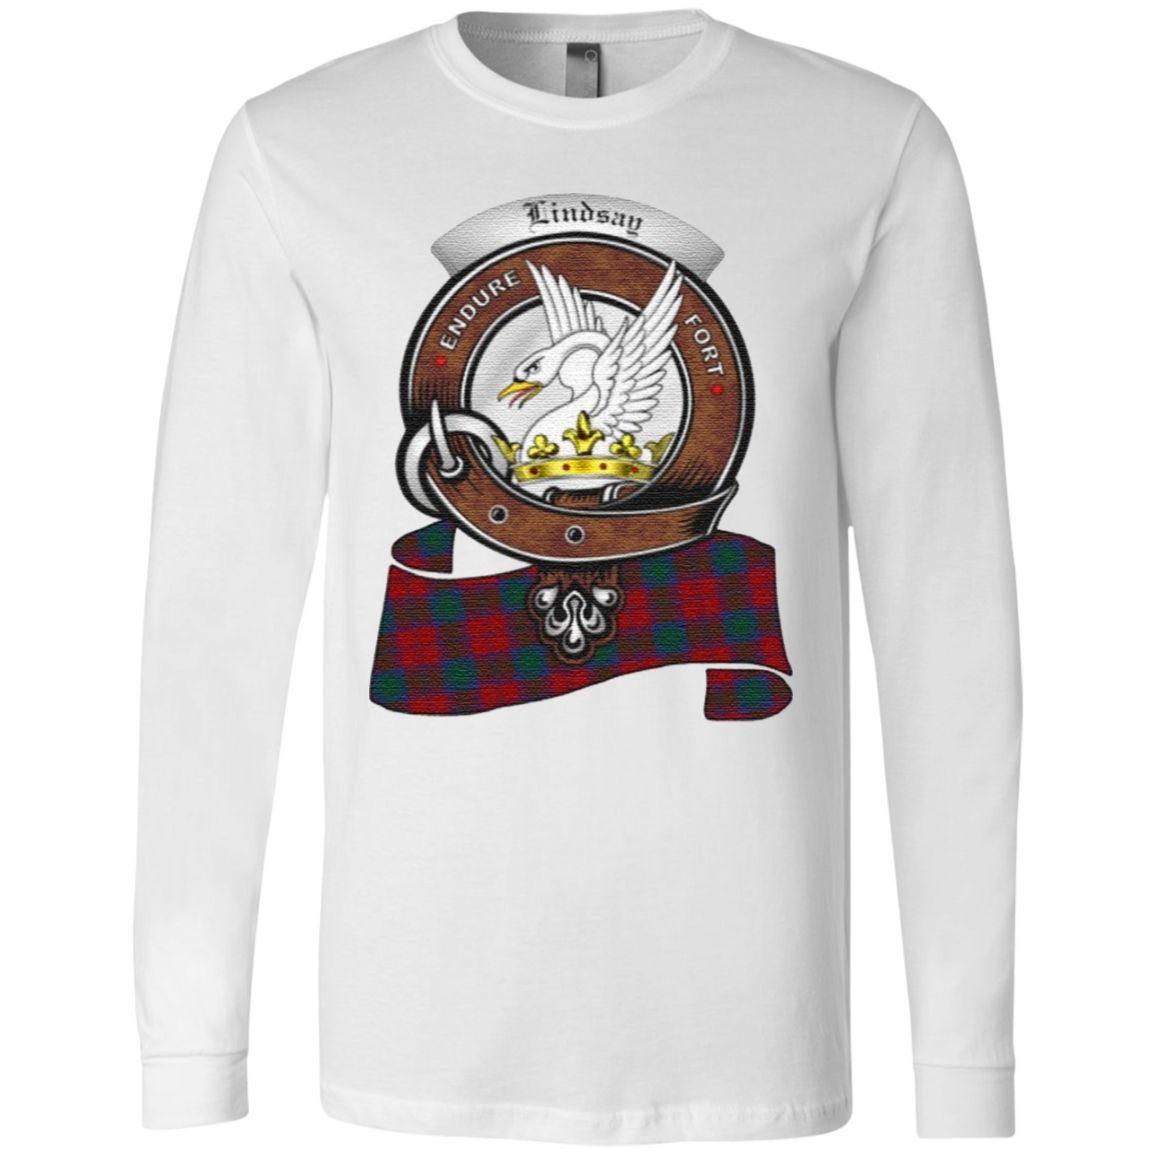 Lindsay Scottish Clan Badge & Tartan TShirt